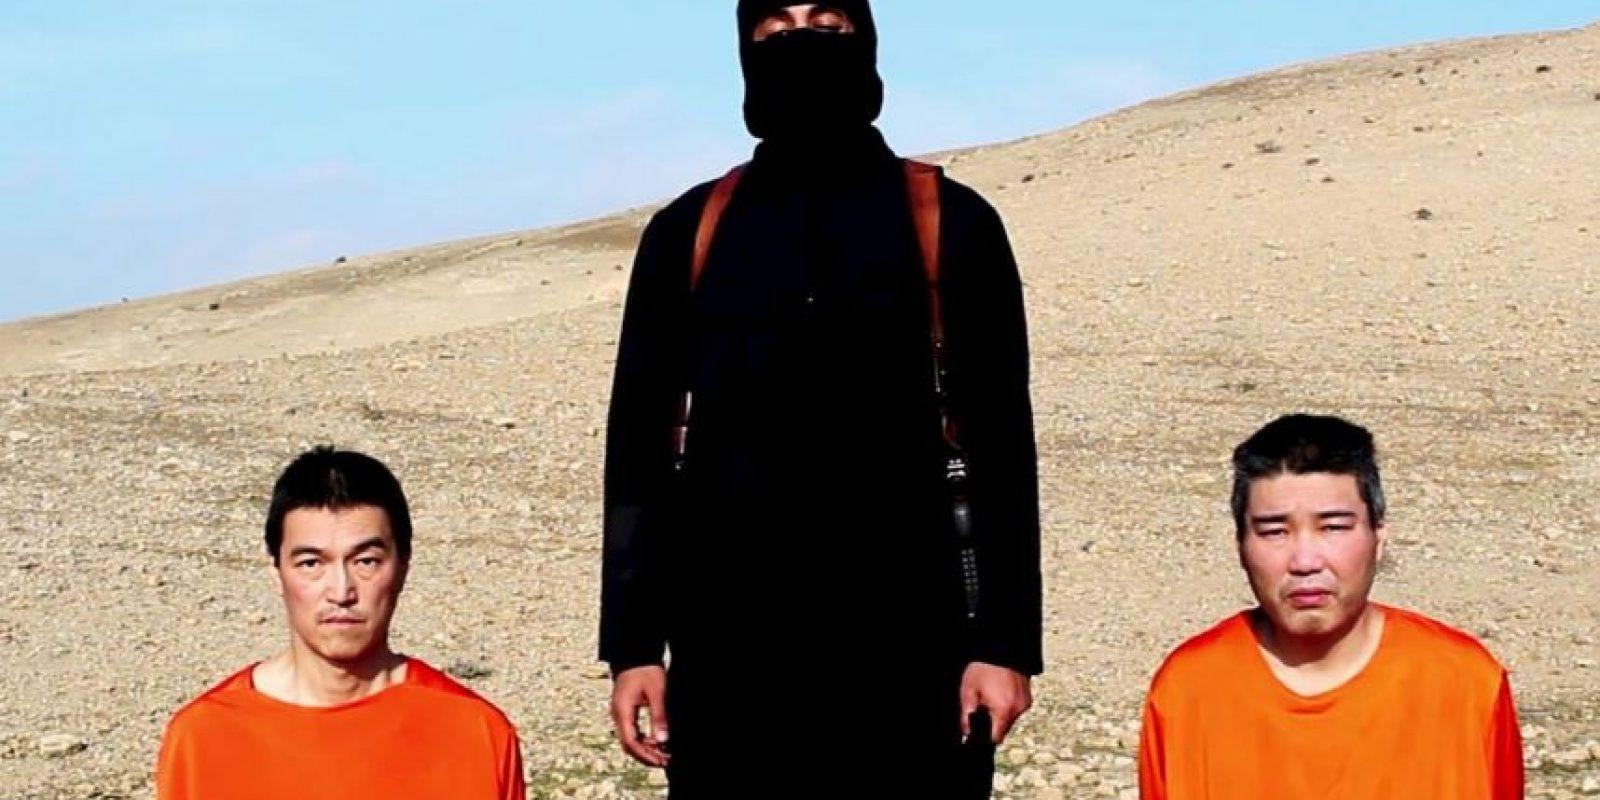 El grupo yihadista mantuvo de rehenes a Haruna Yukawa y Kenji Goto. Foto:AP